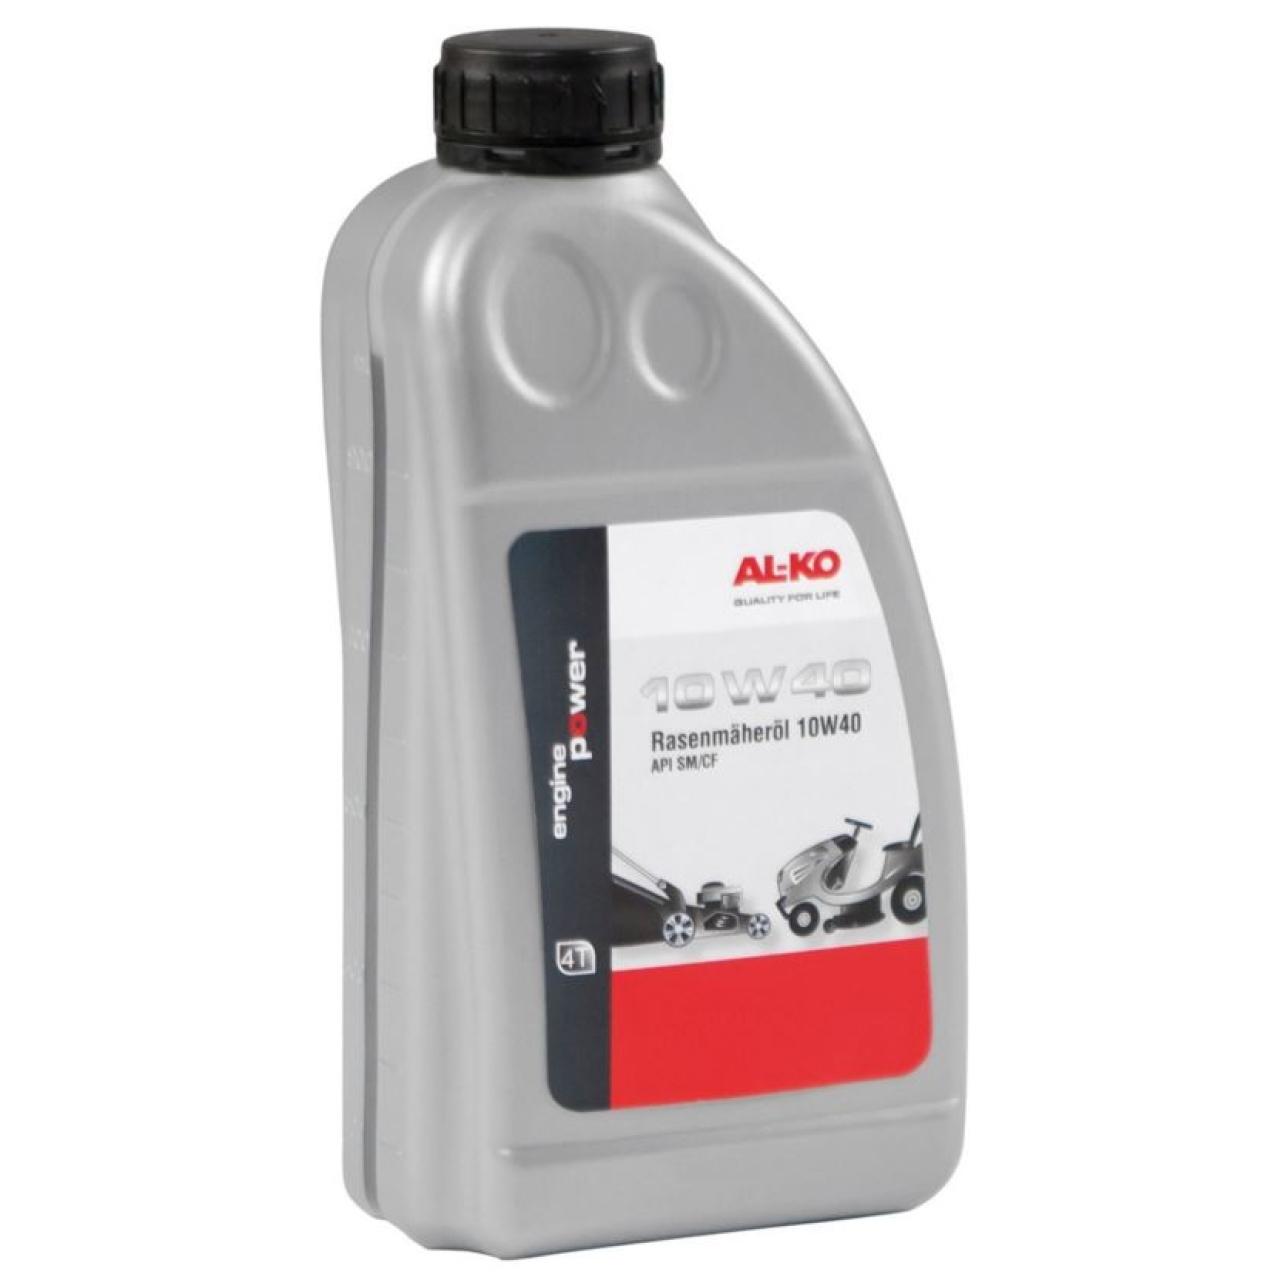 4-Takt Rasenmäheröl 10W40 (1,0 L)